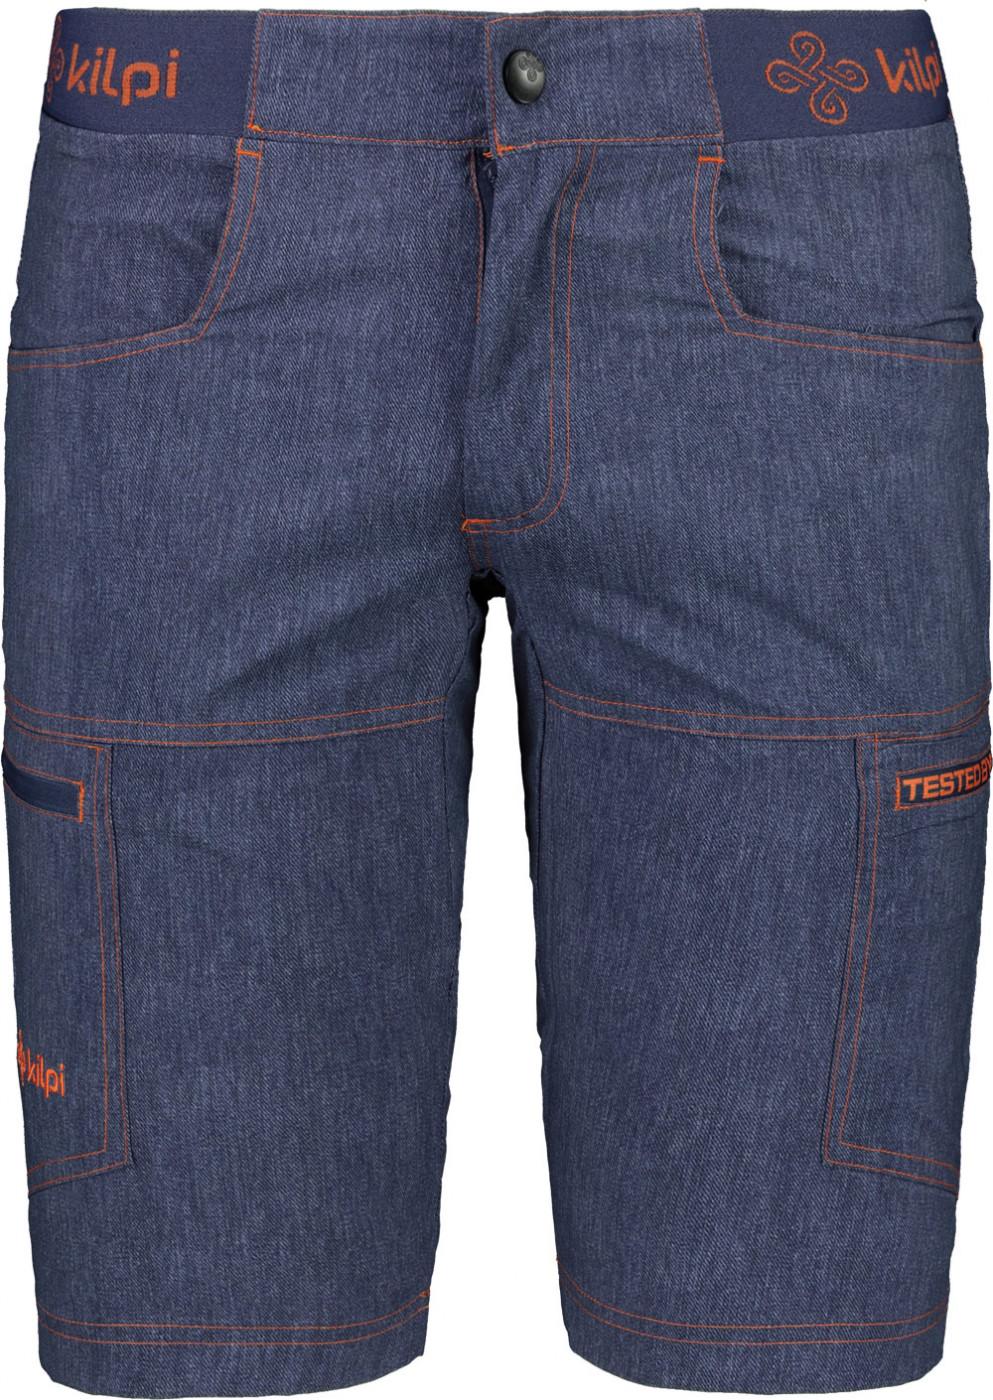 Men's shorts Kilpi ASHER-M